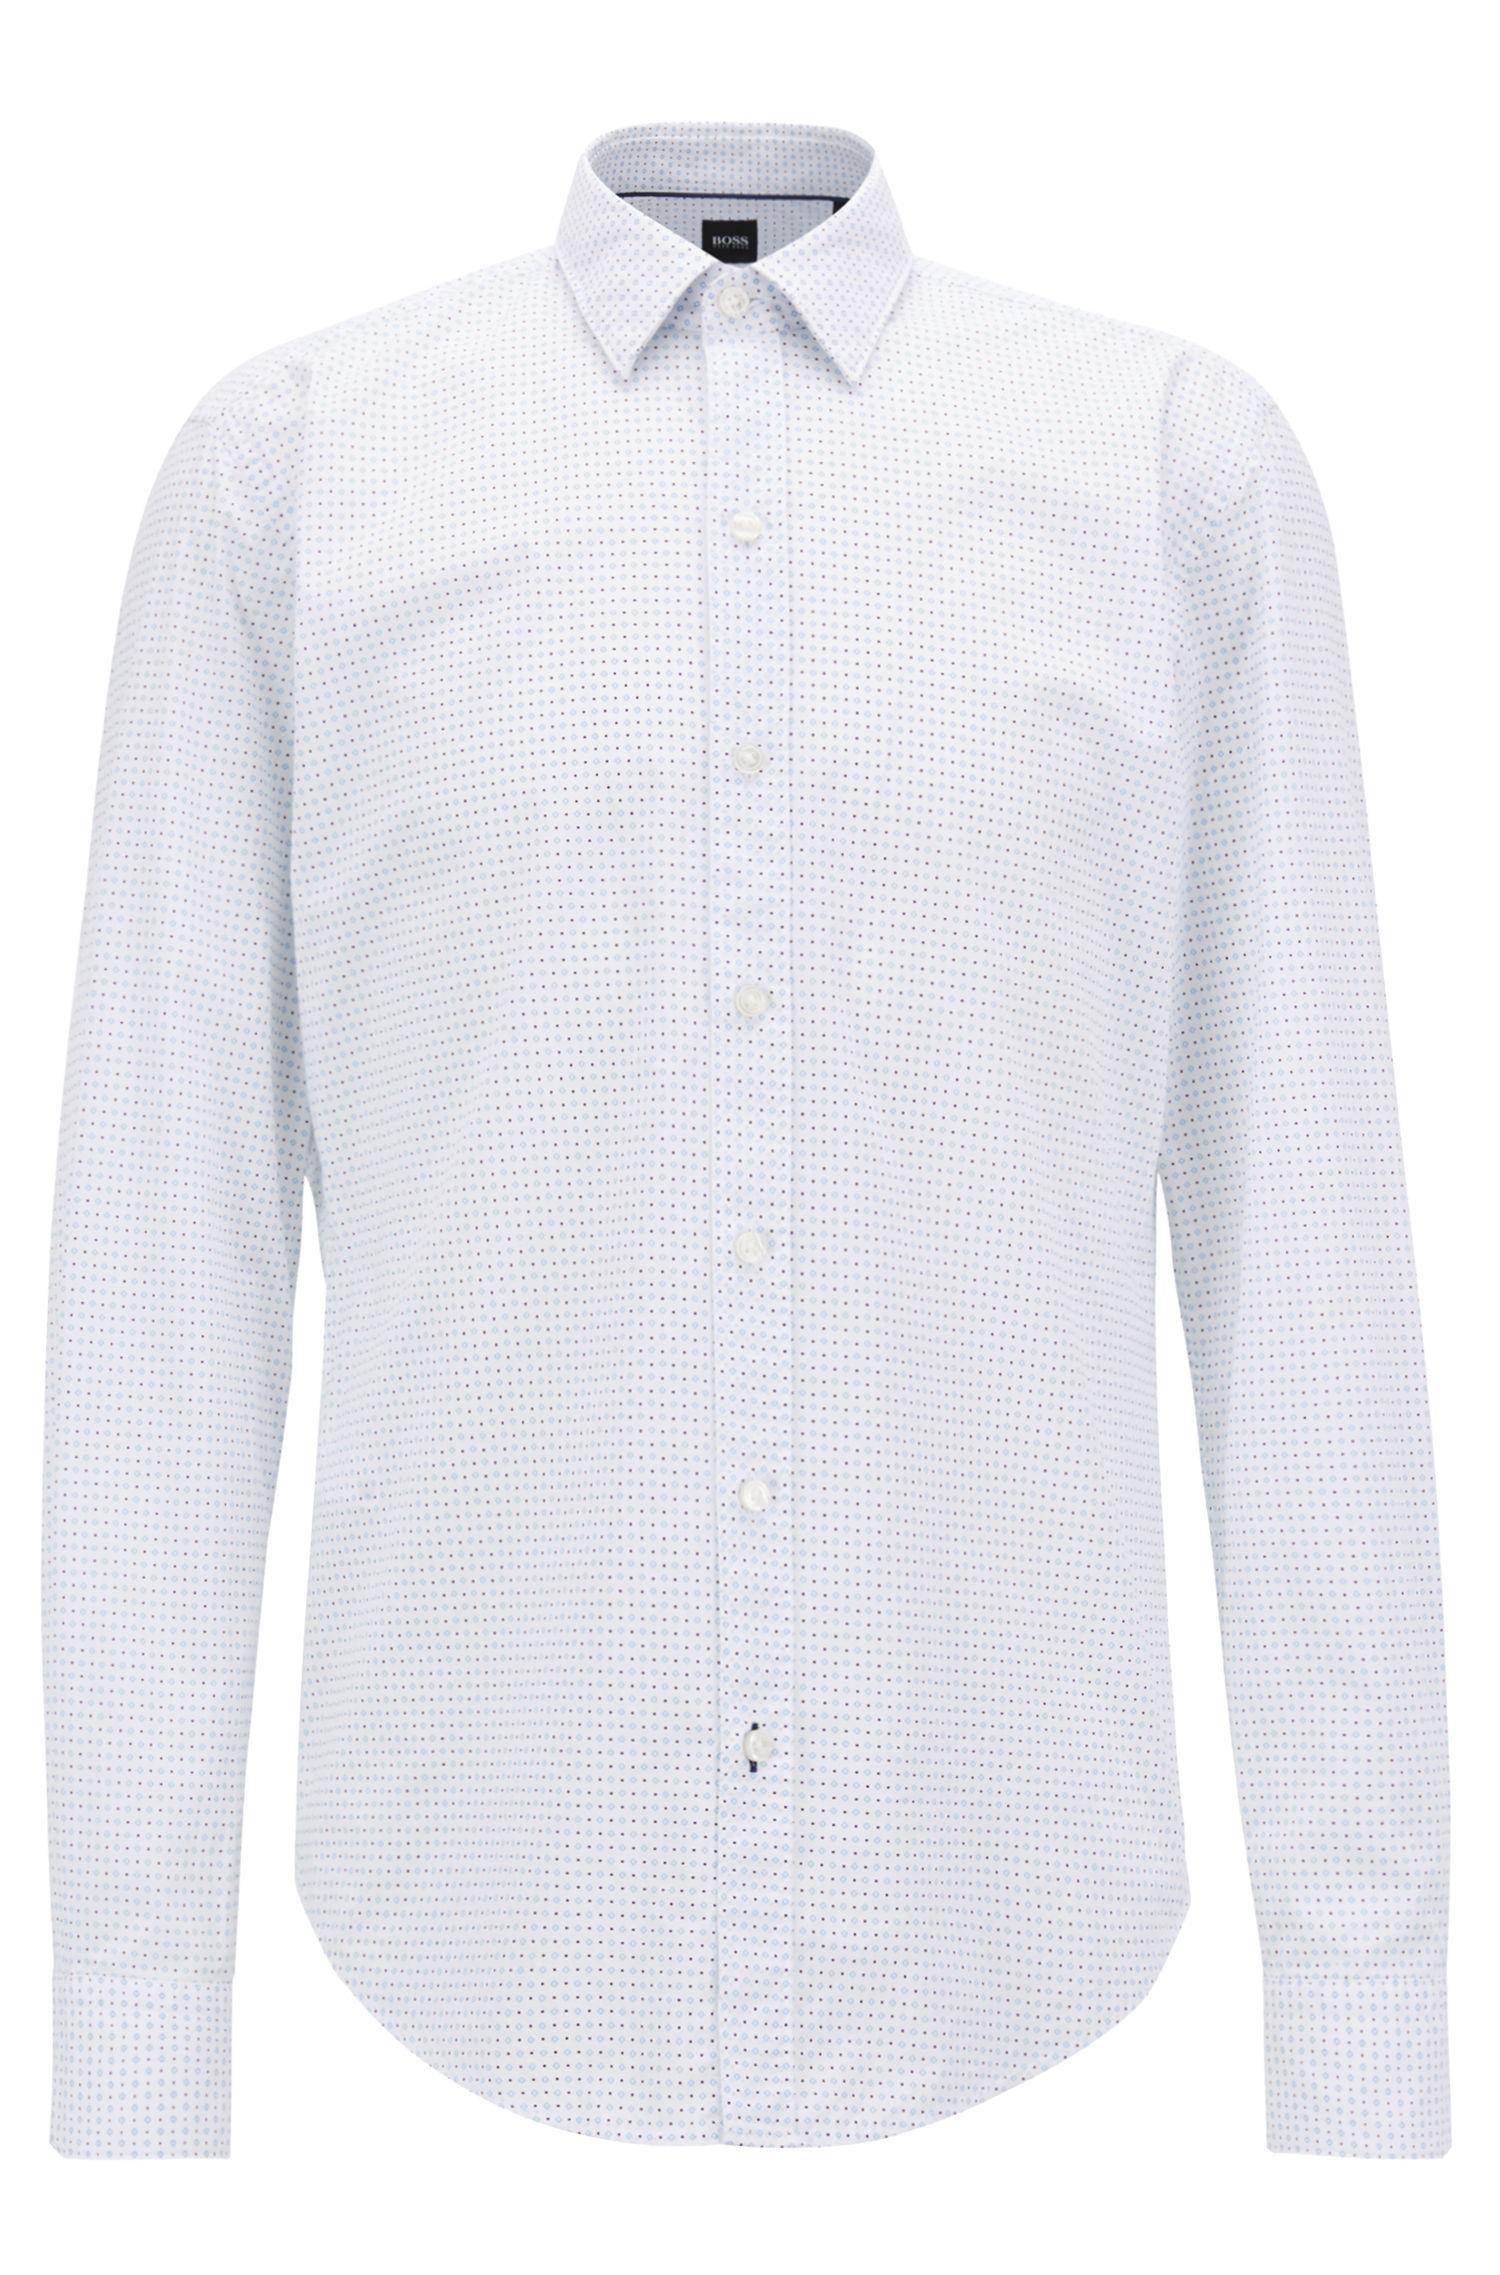 Soft Cotton Shirt, Sharp Fit | Robbie